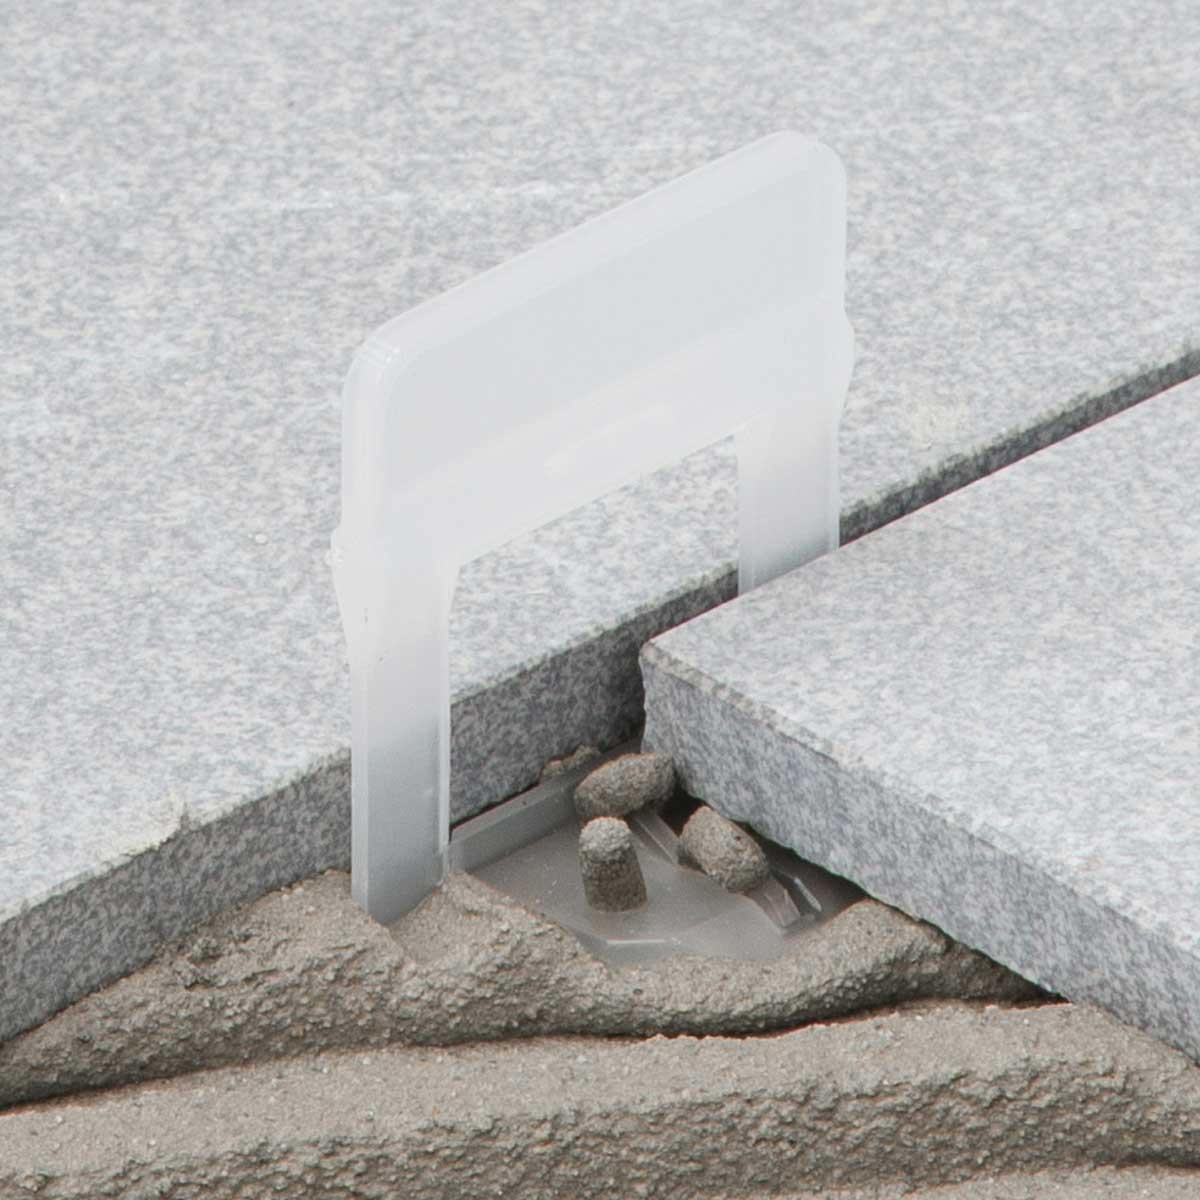 raimondi clear clip in mortar ceramic tile corners